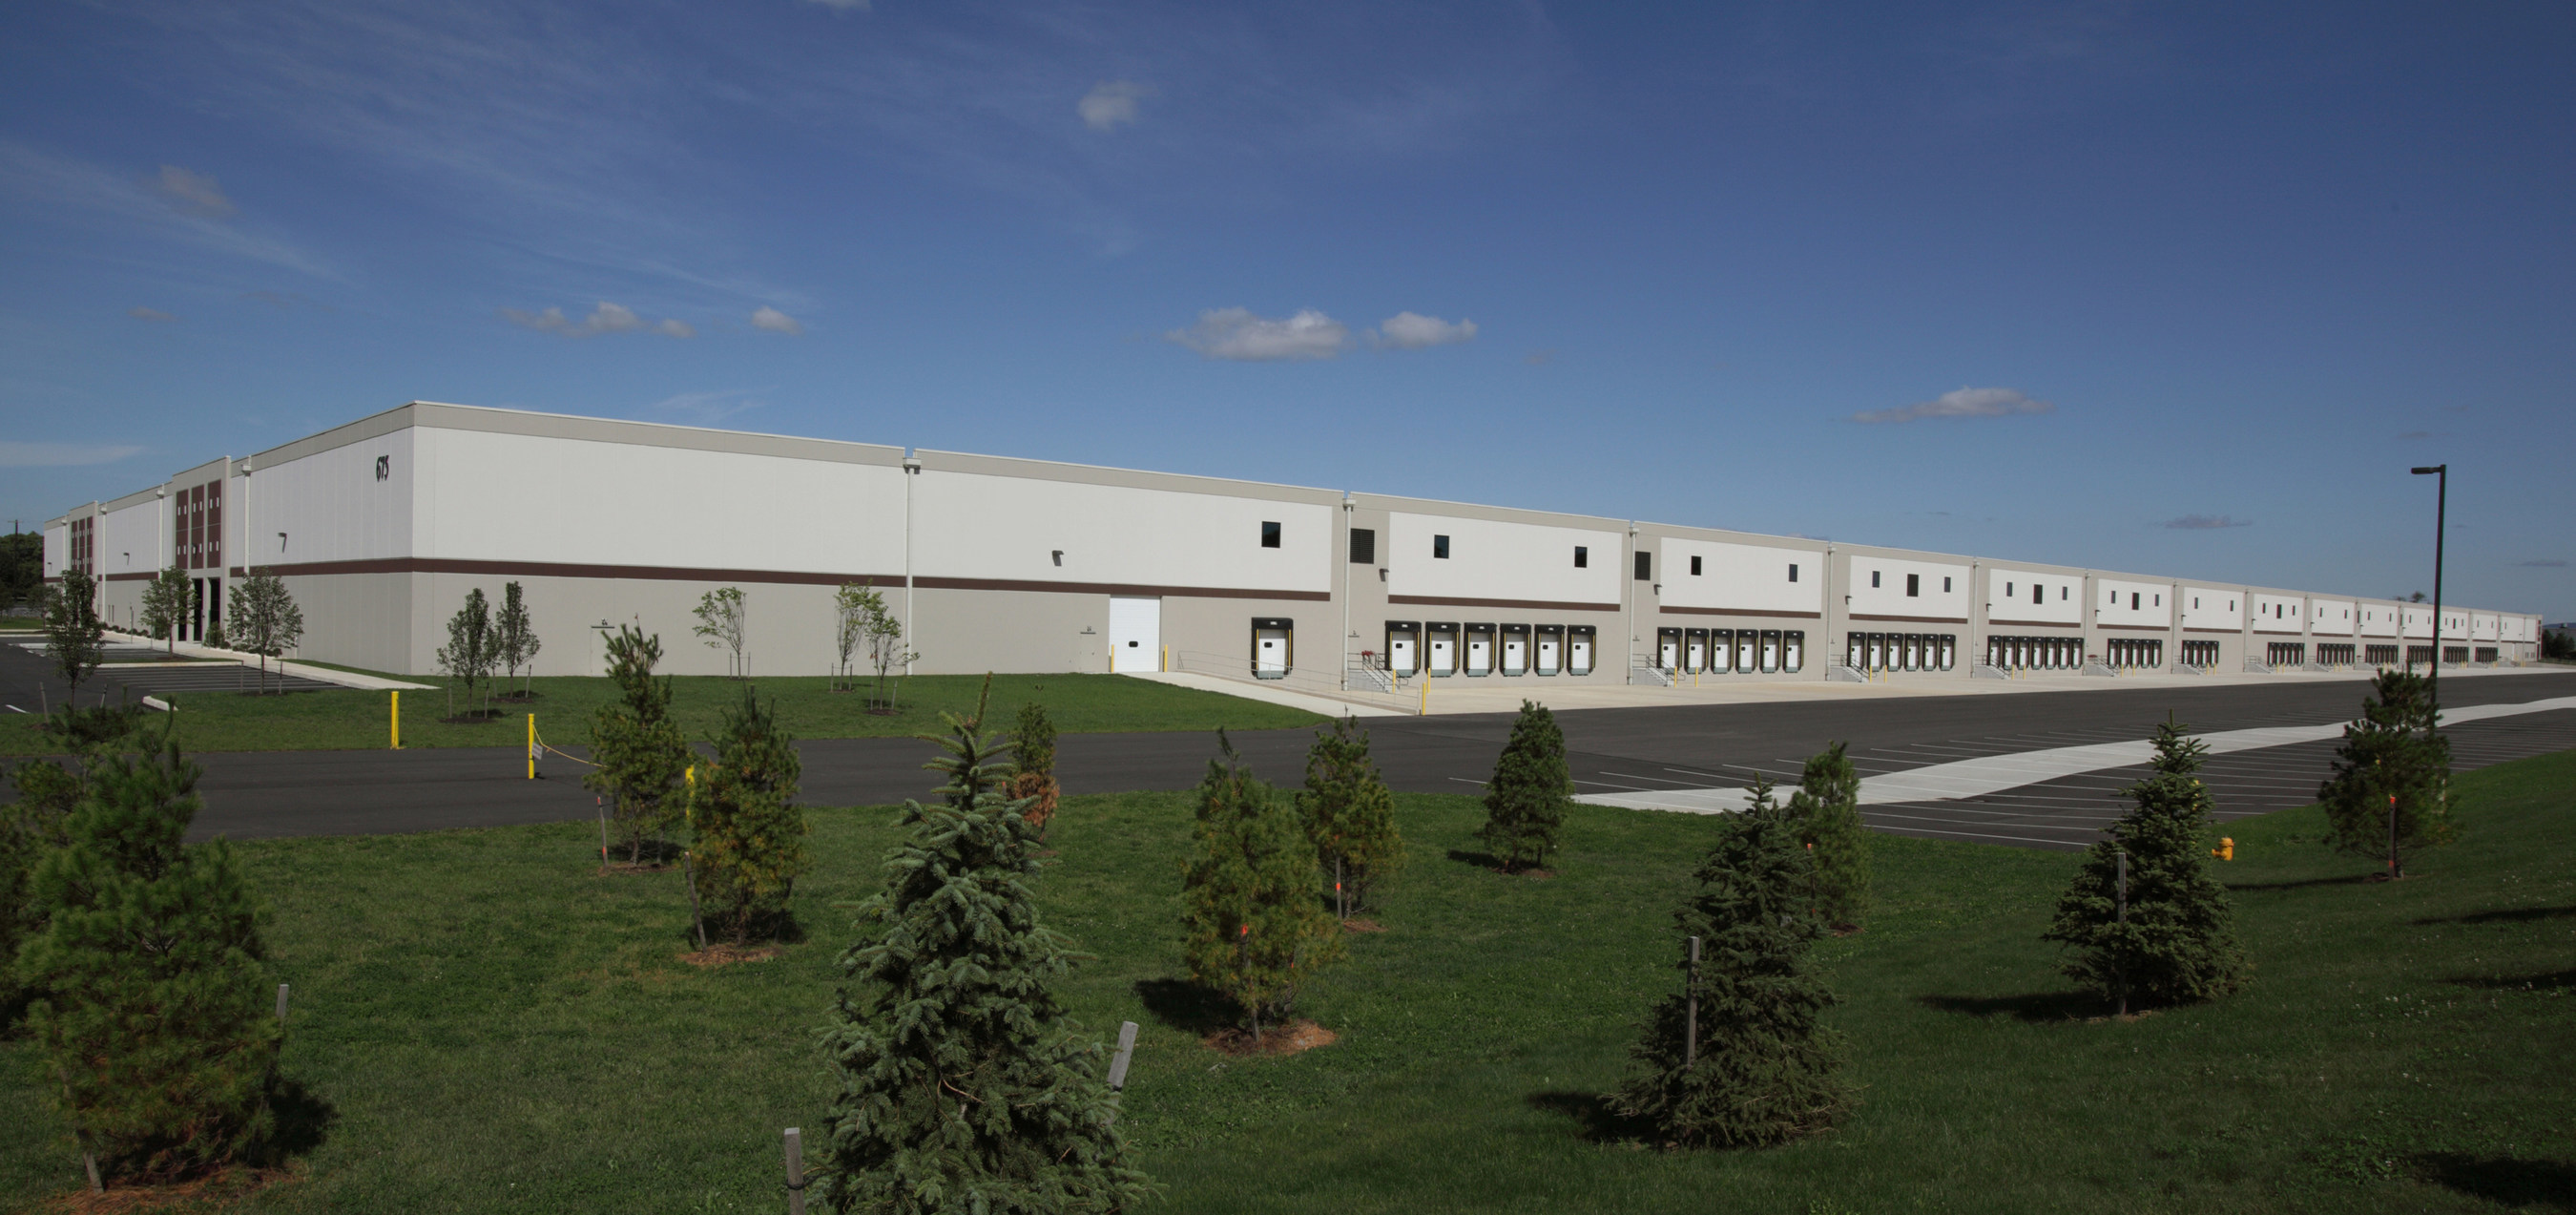 USAA Real Estate Company Announces Recapitalization of Industrial Portfolio